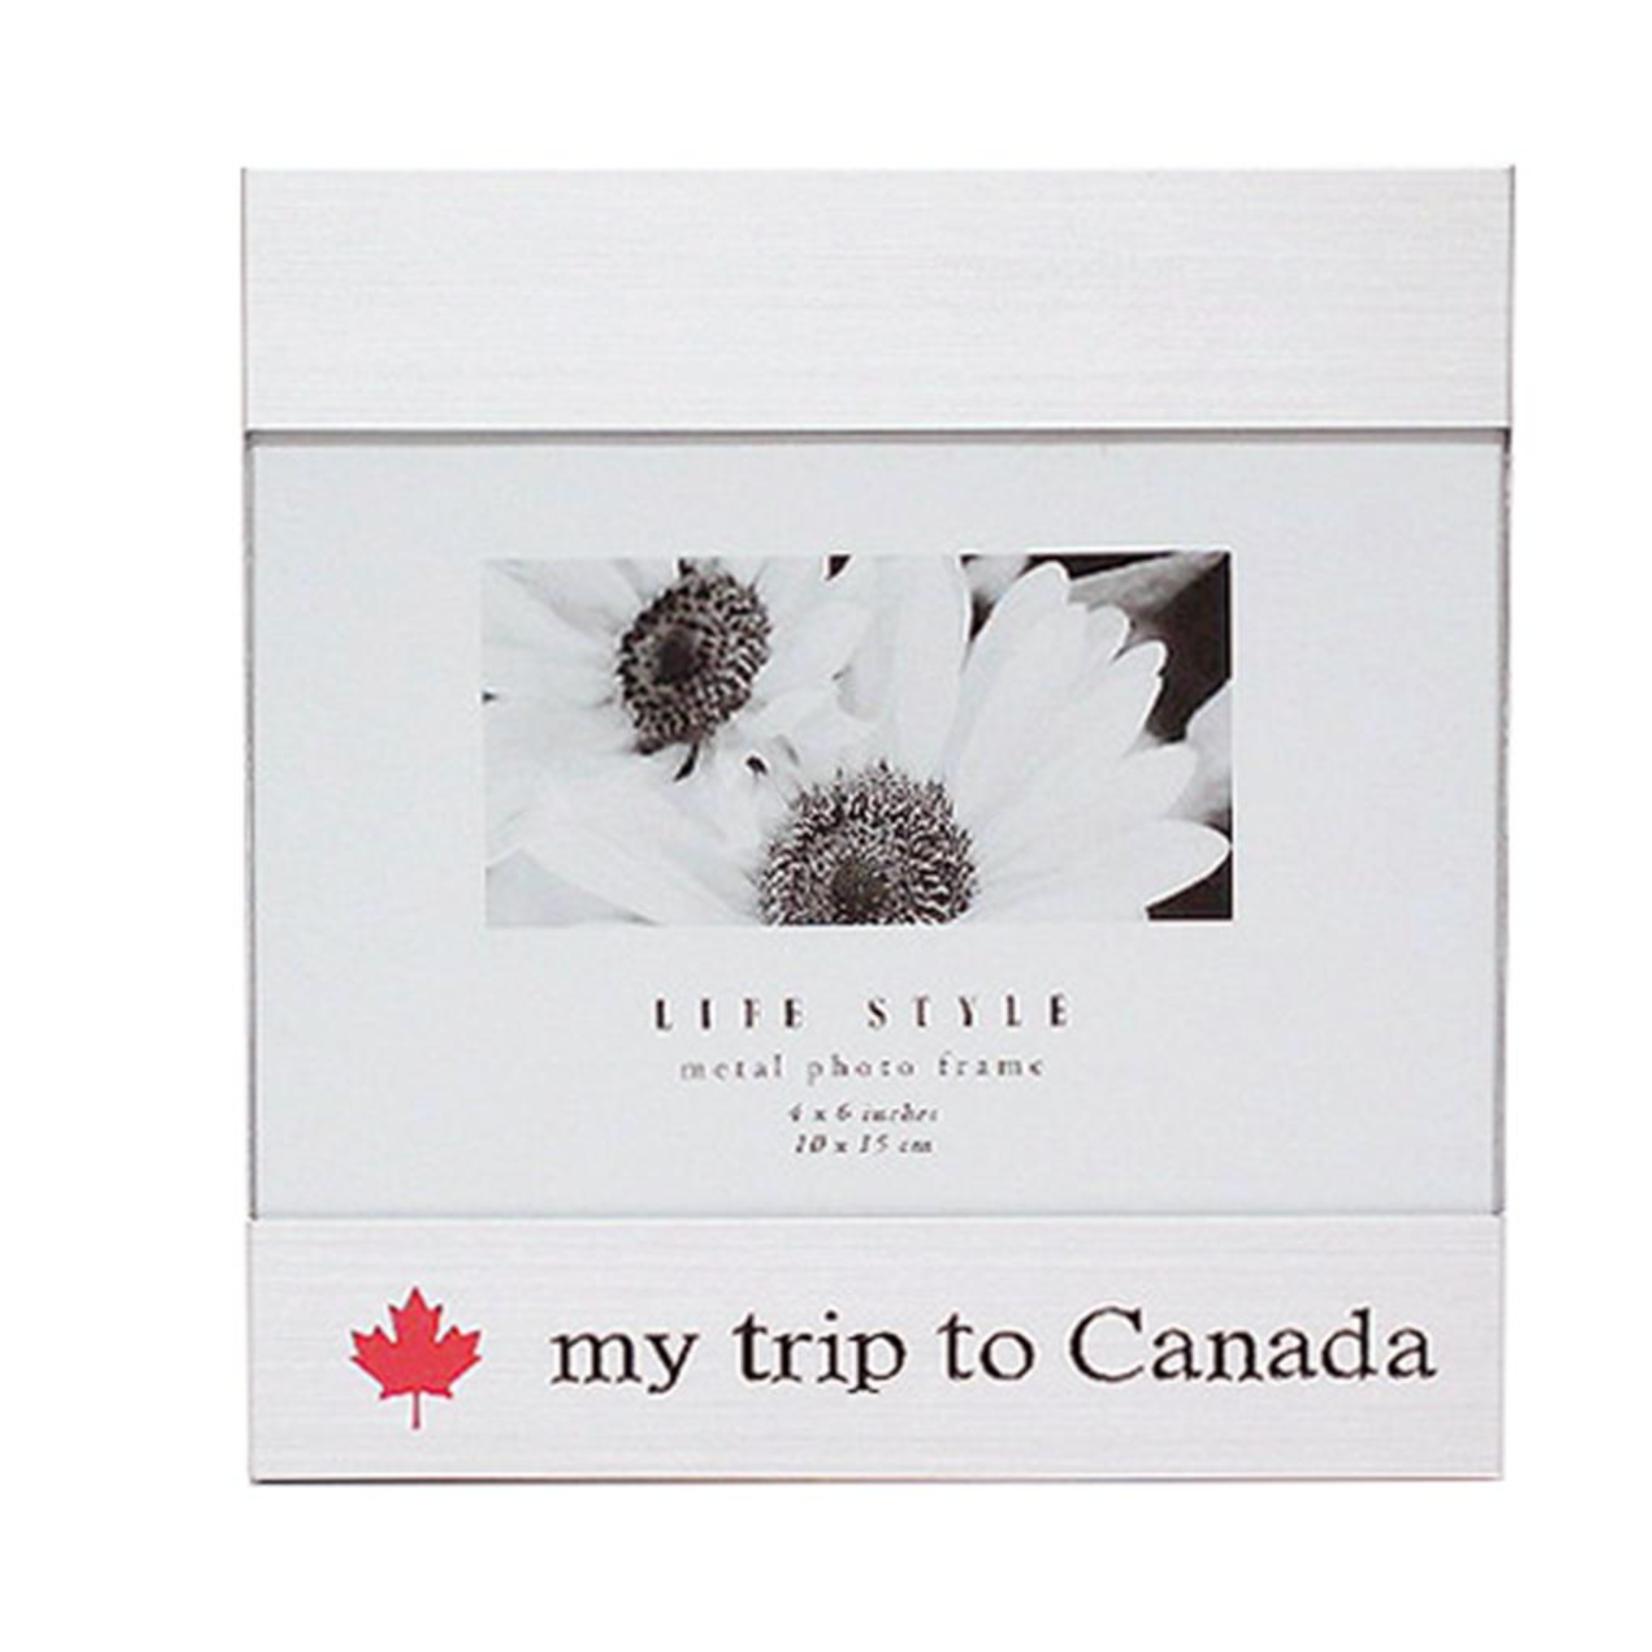 My trip to Canada frame